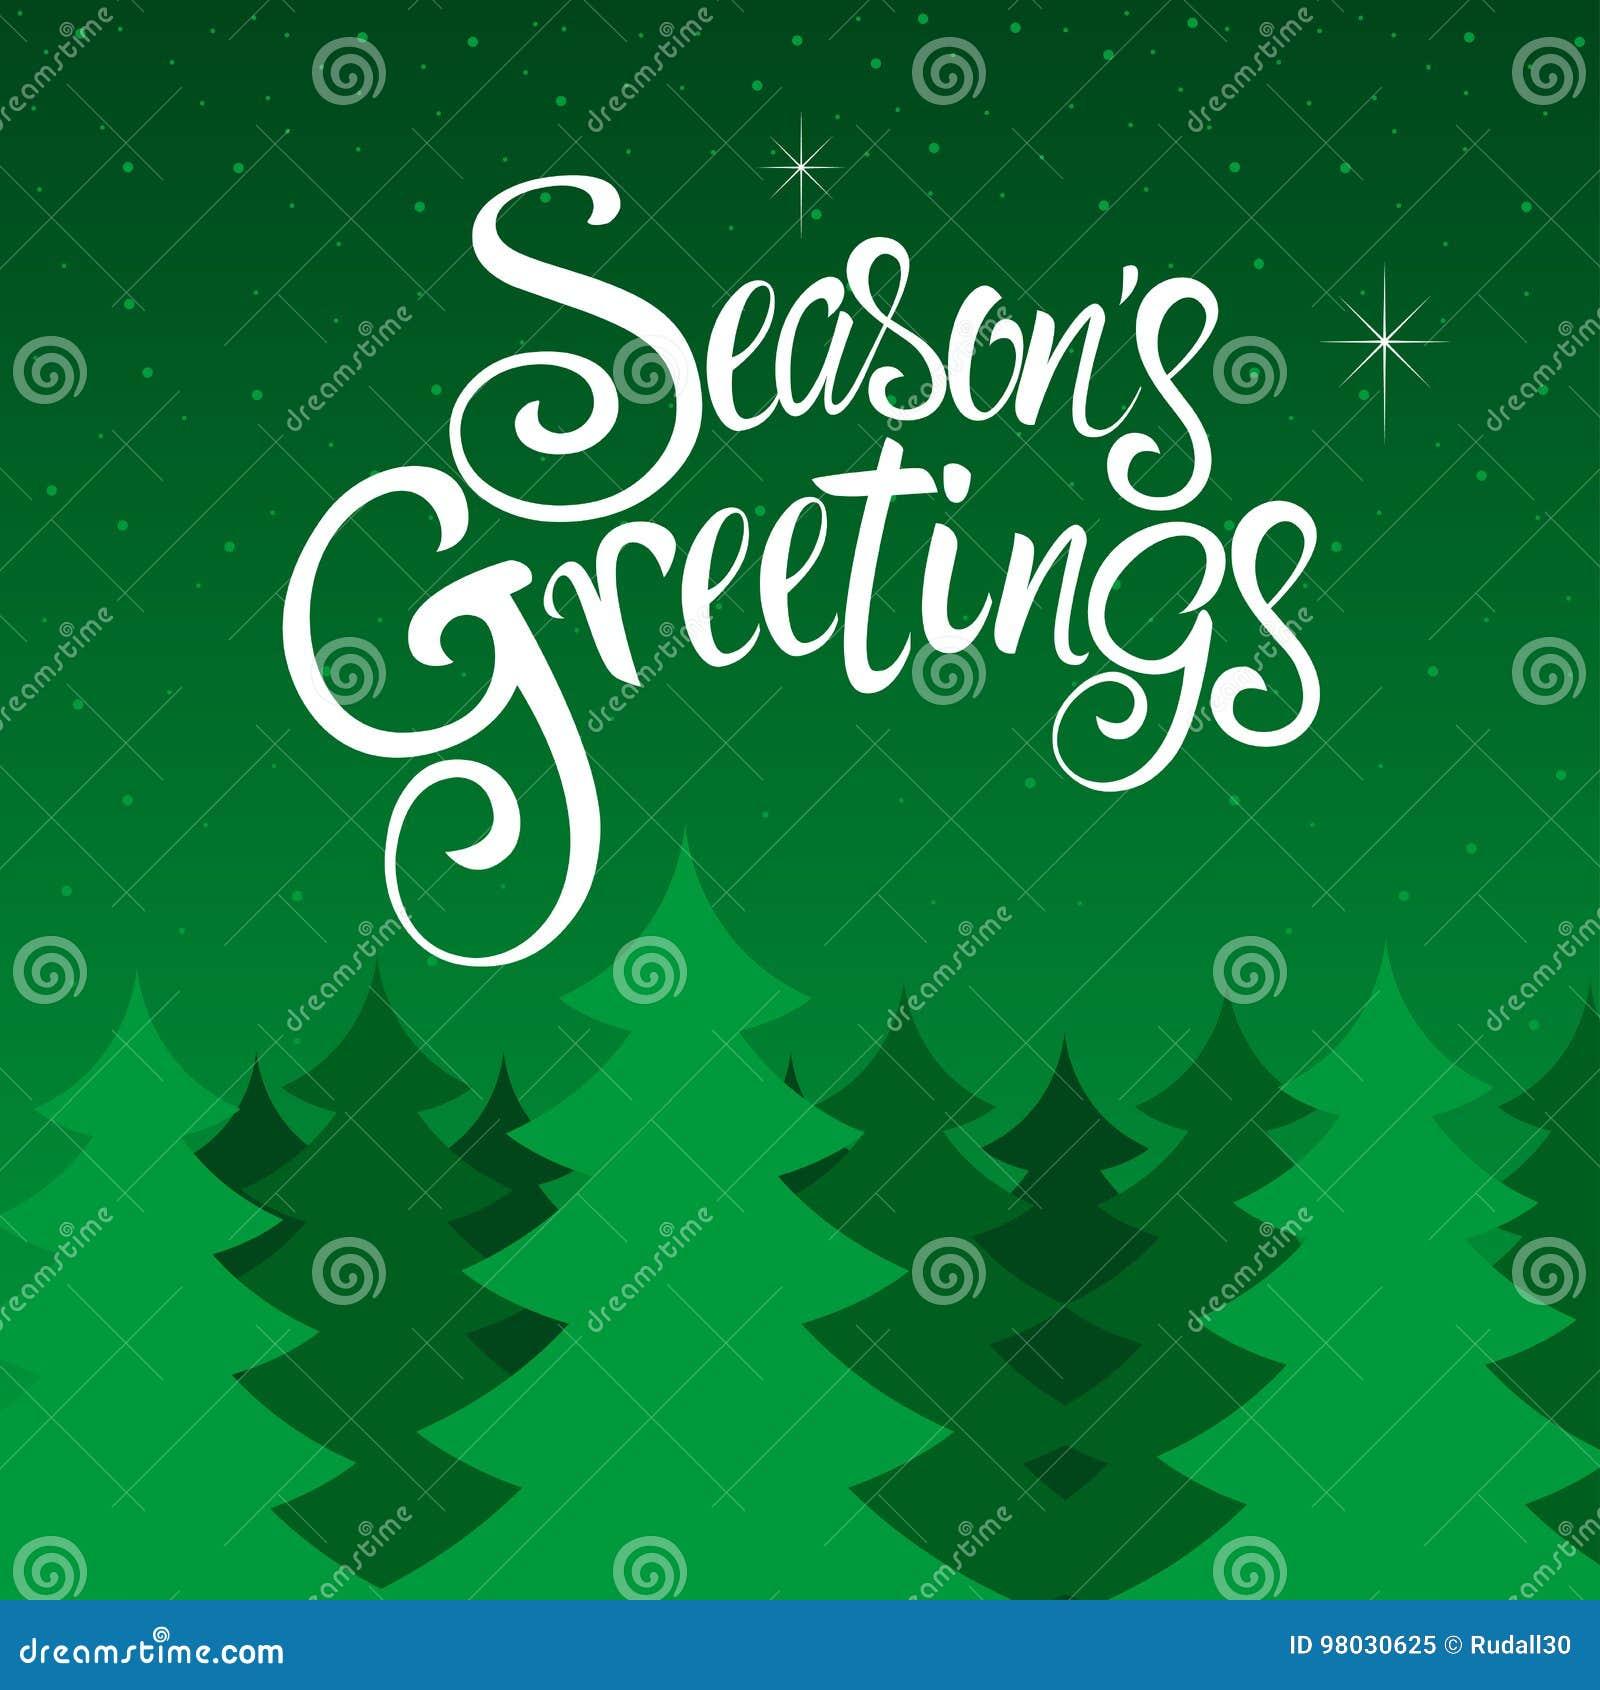 Seasons Greetings Text Stock Vector Illustration Of Font 98030625